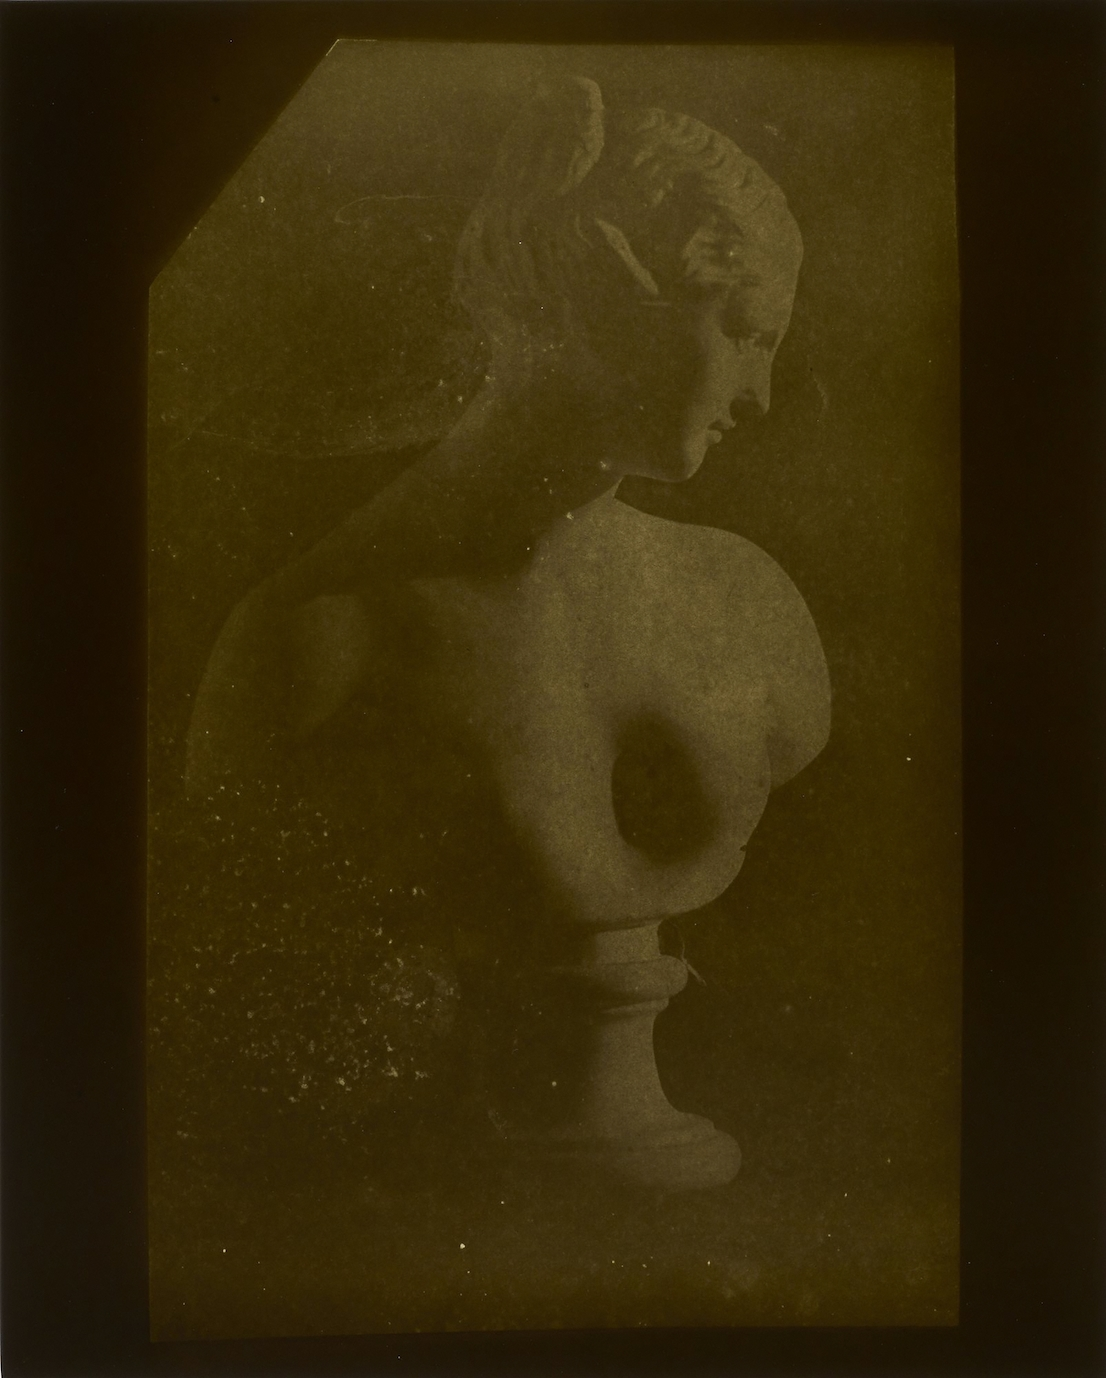 Hiroshi Sugimoto, Bust of Venus, November 26, 1840, 2009